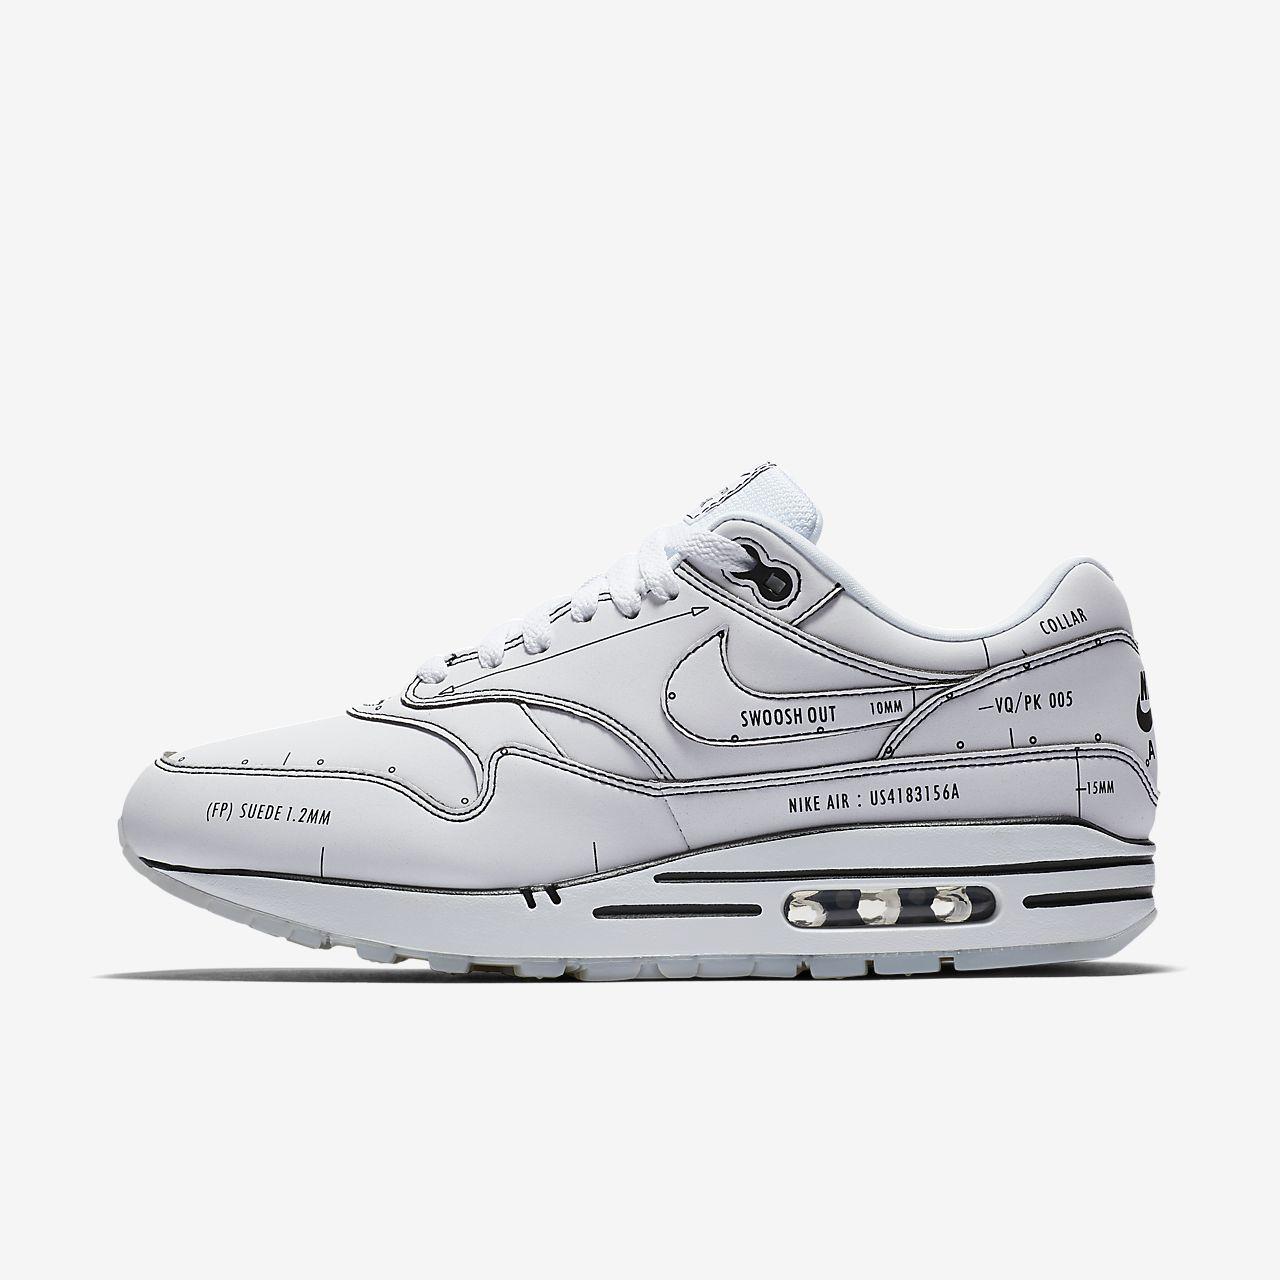 cheaper recognized brands fresh styles Nike Air Max 1 Sketch To Shelf Men's Shoe